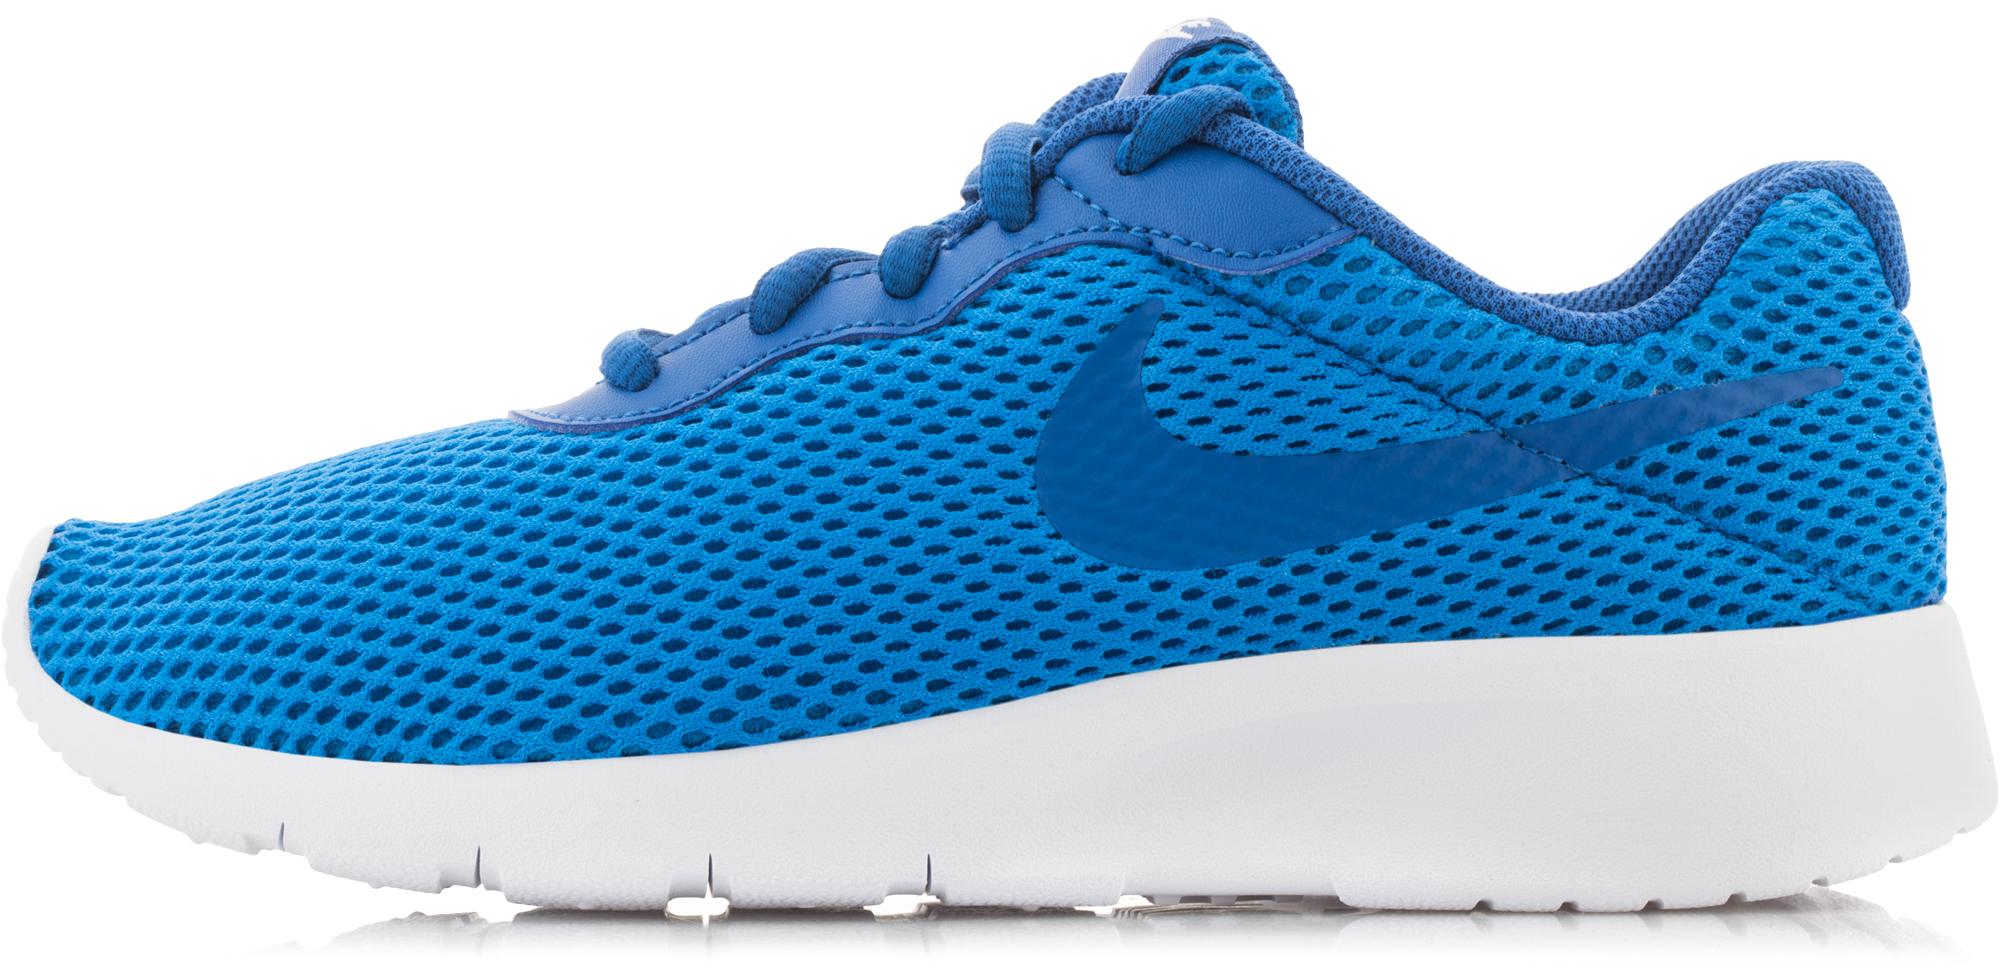 Nike Кроссовки для мальчиков Nike Tanjun Br кроссовки для мальчиков сказка